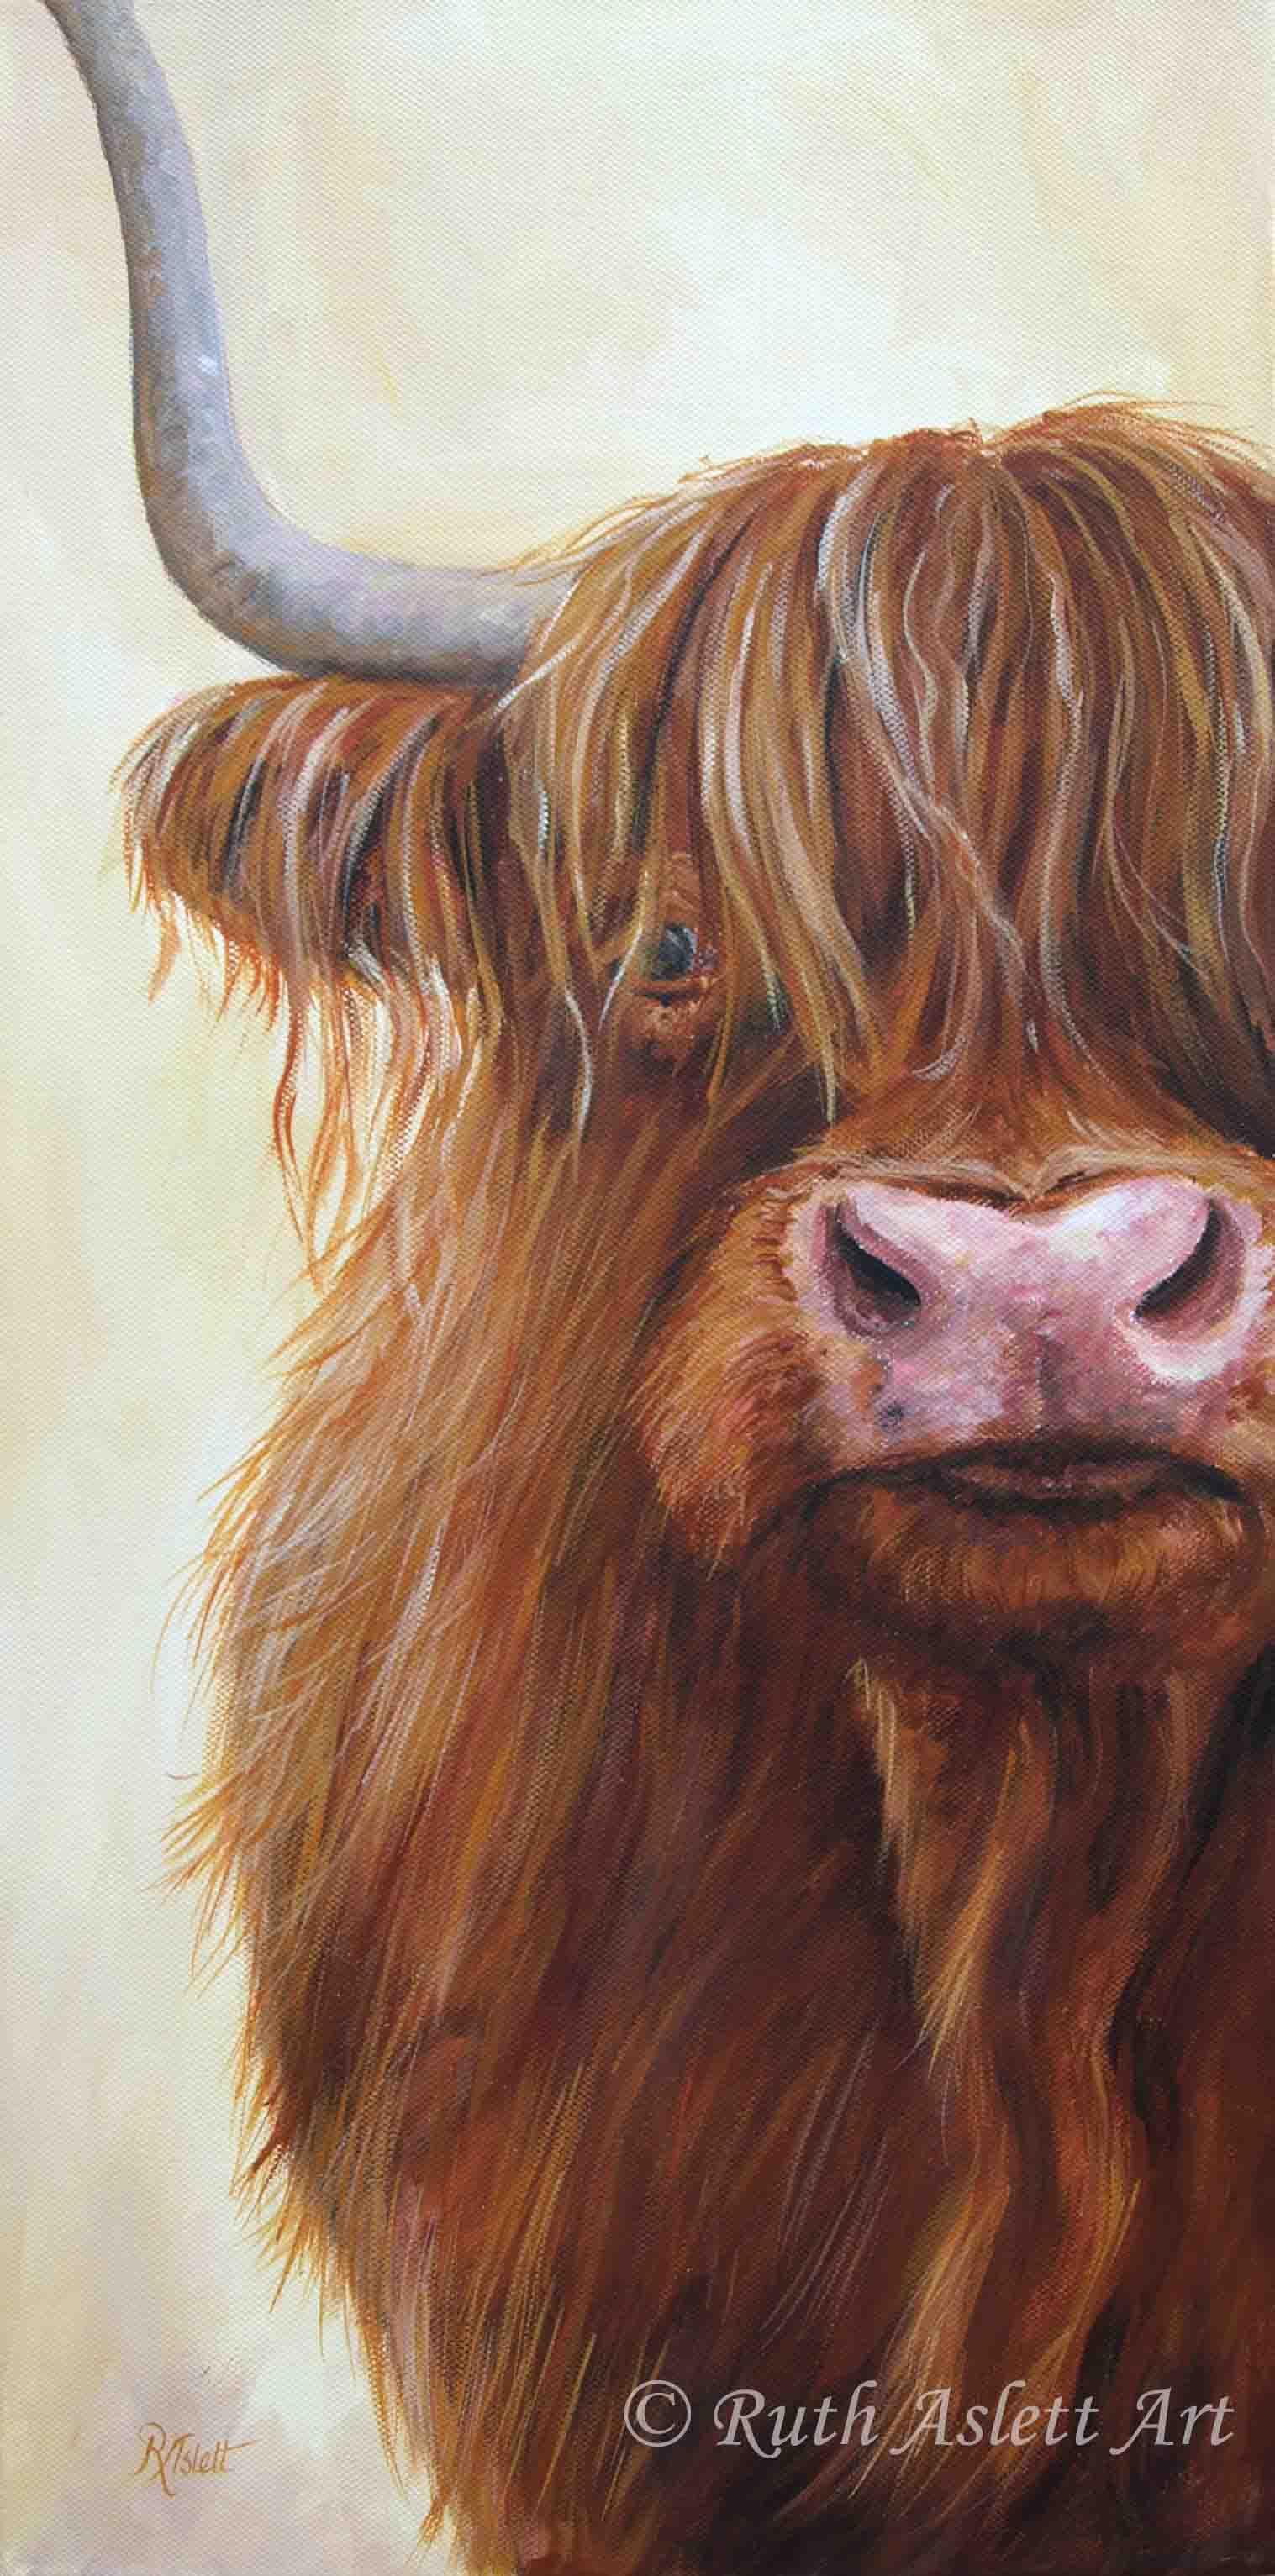 Farm Animals Highland Cow Painting Highland Cow Art Cow Art